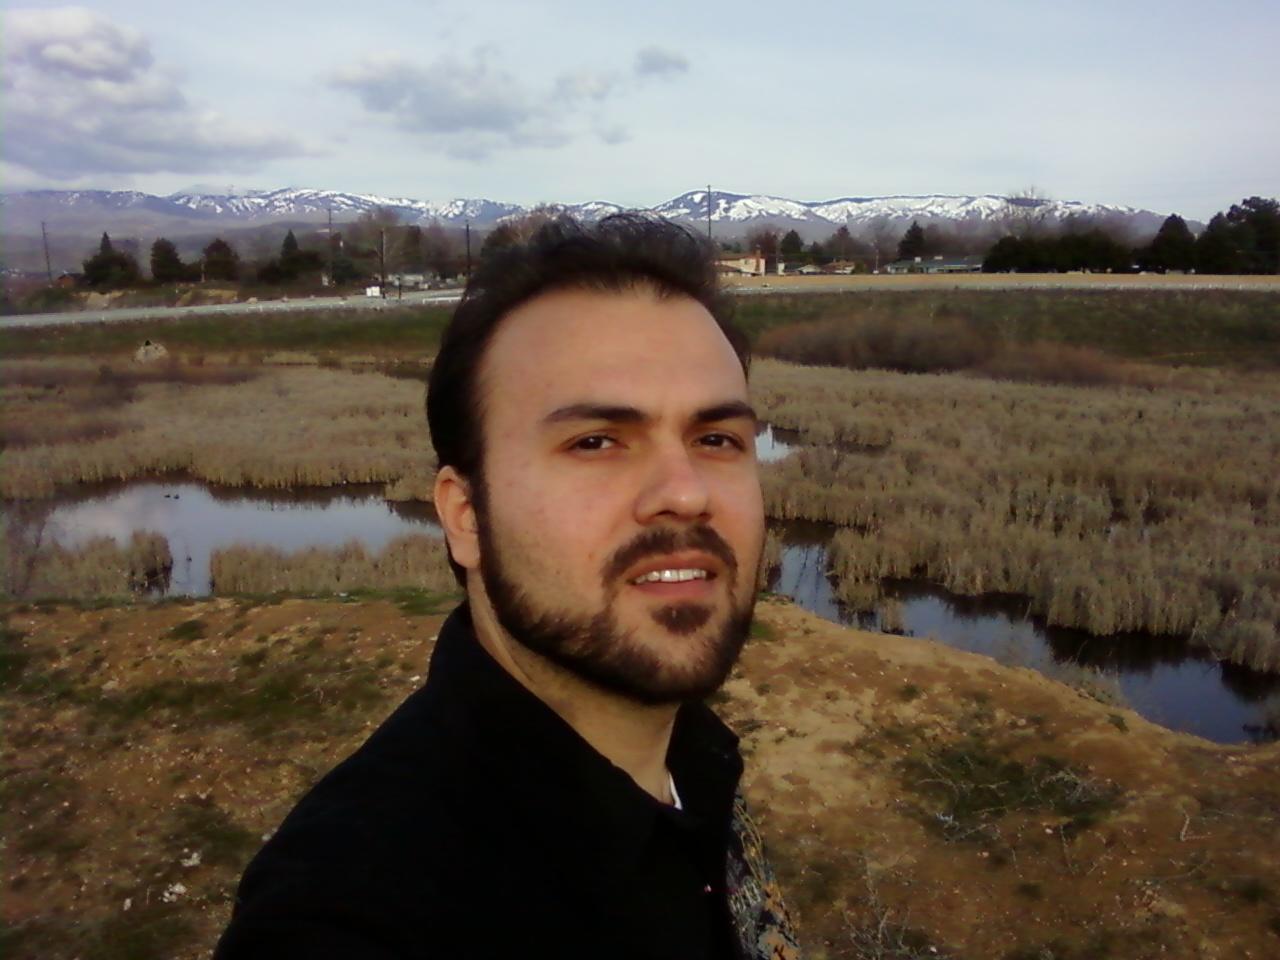 Christian Pastor Saeed Abedini